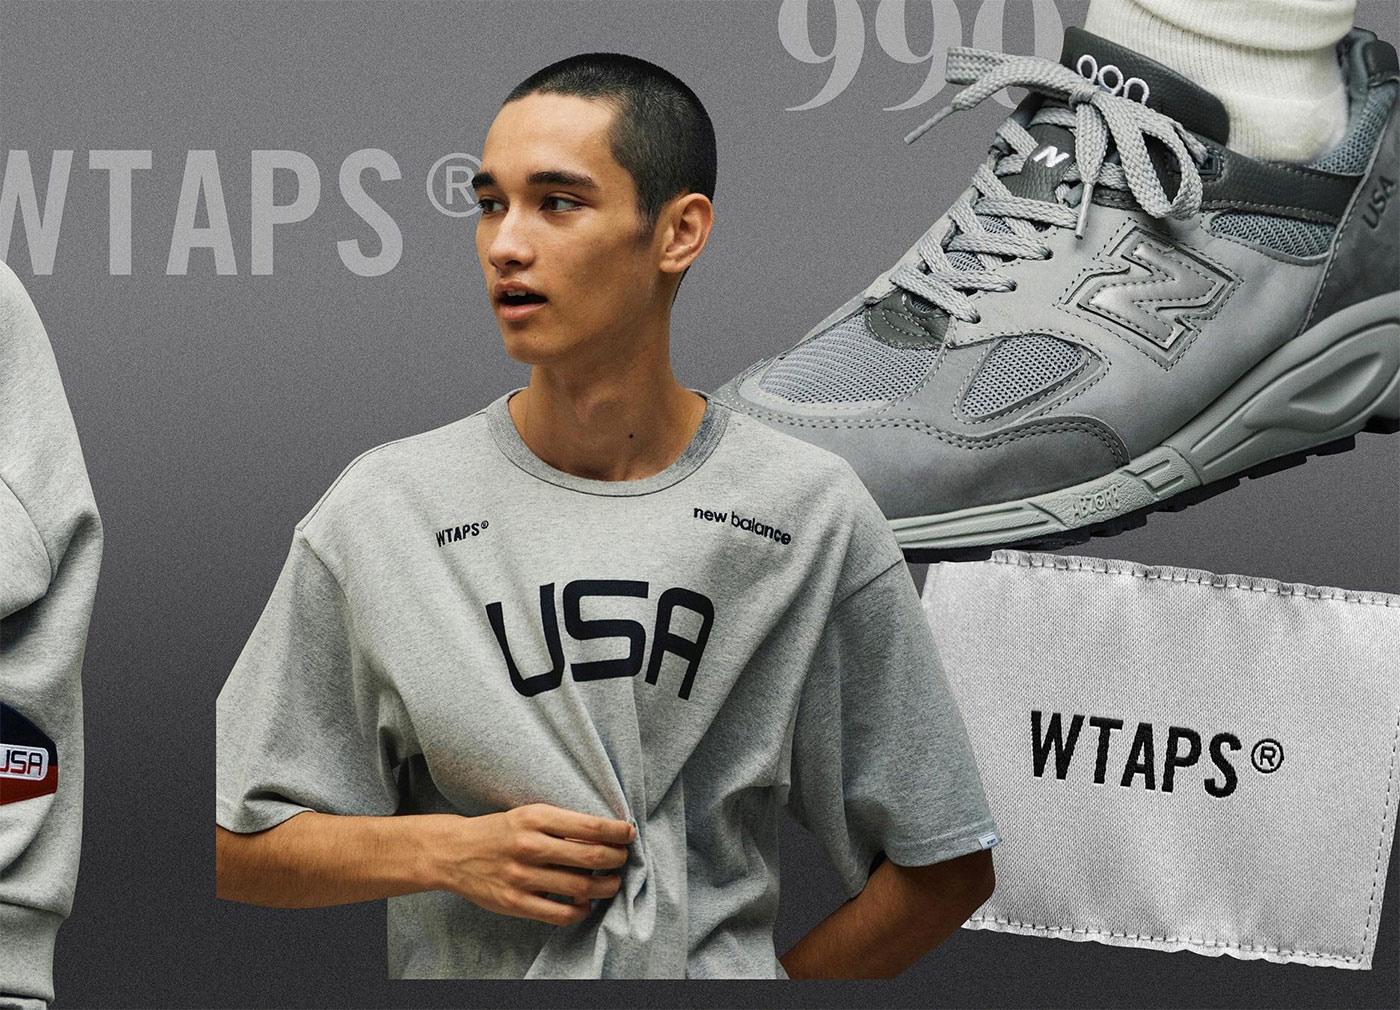 wtaps-new-balance-990v2-03